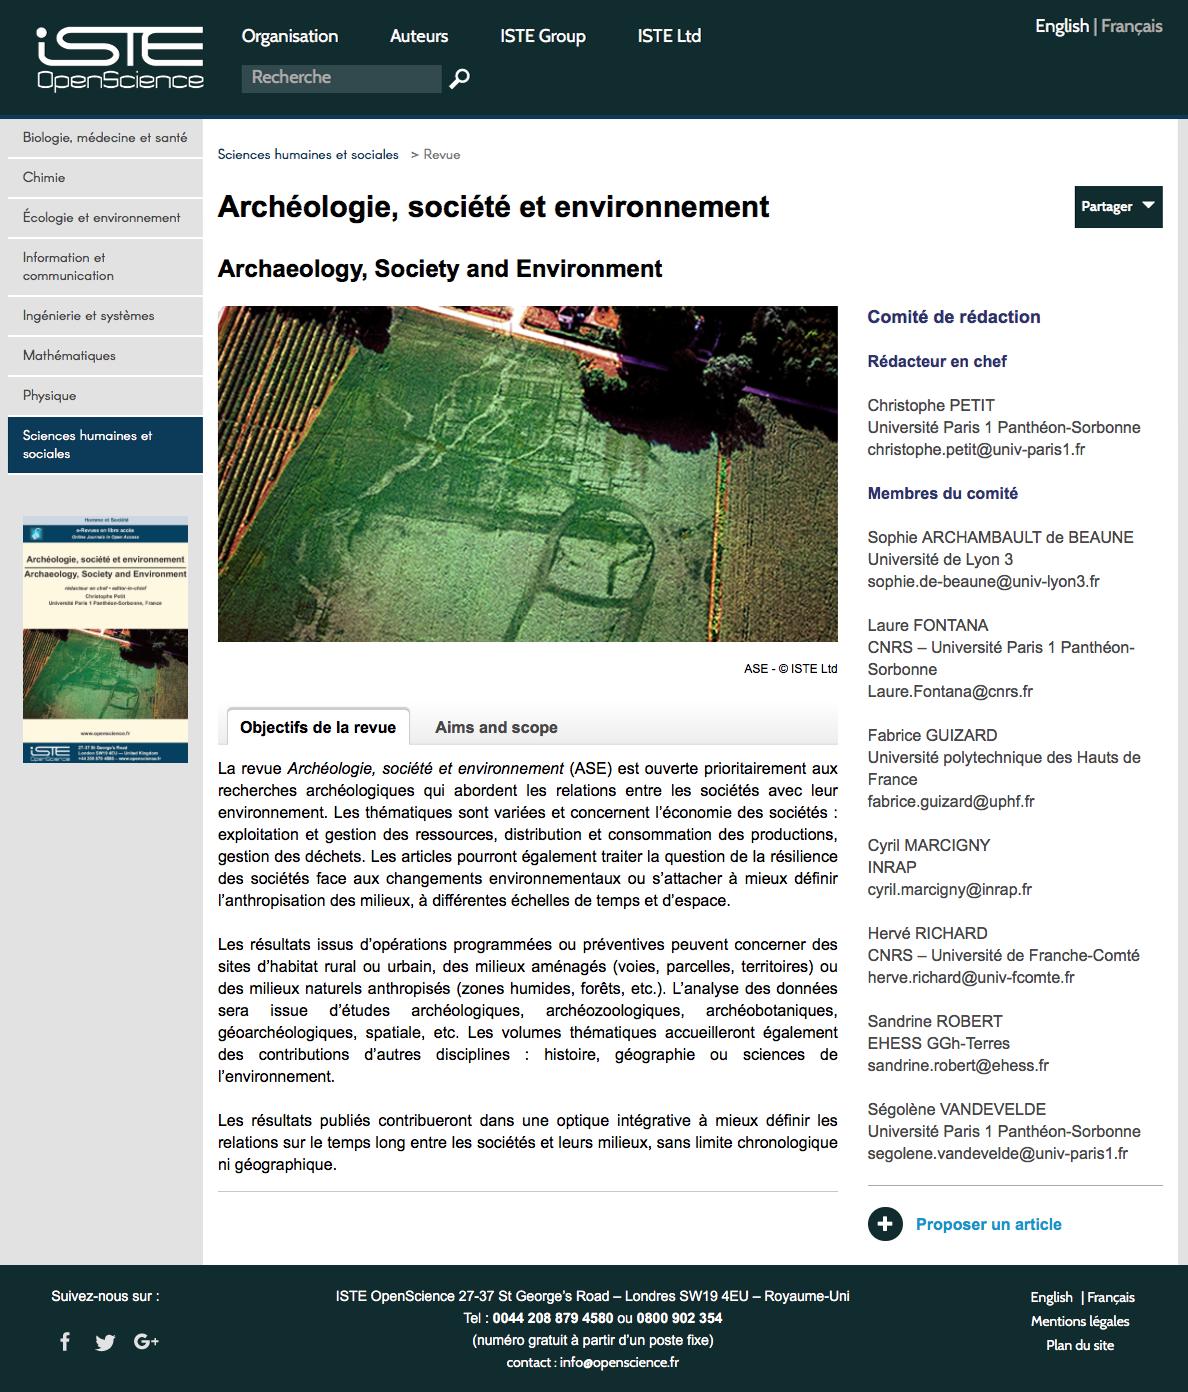 https://www.openscience.fr/Archeologie-societe-et-environnement